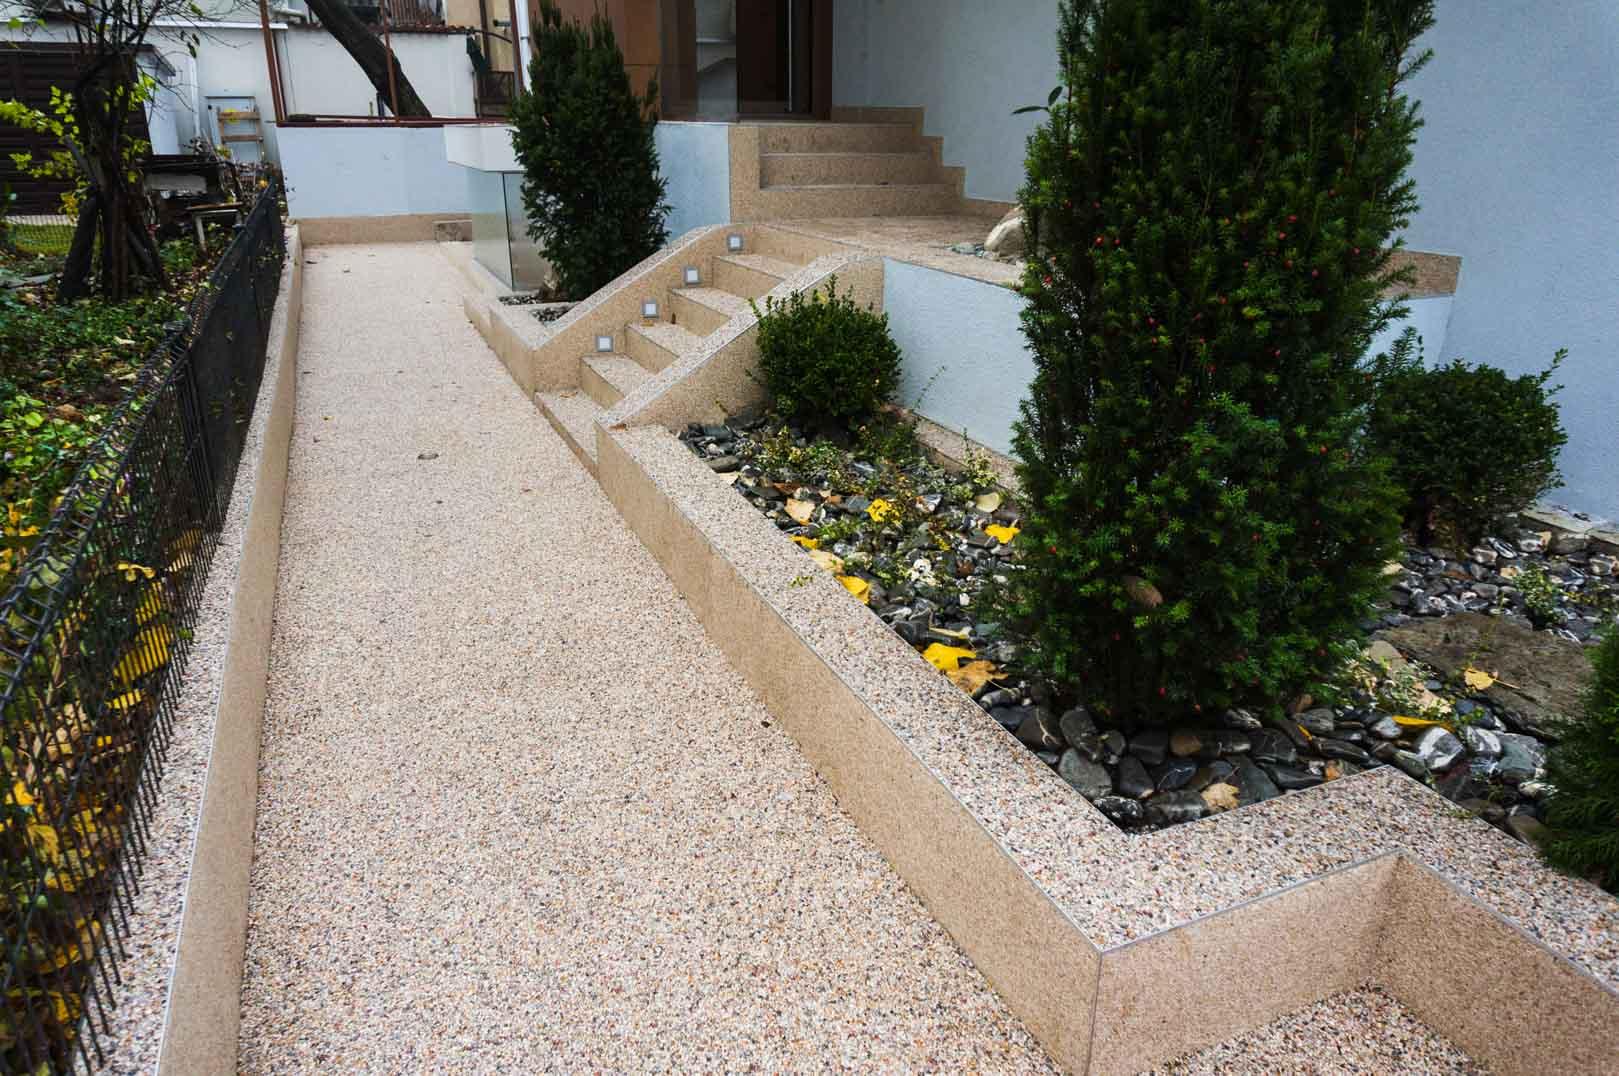 viarustik-stone-carpet-footpath